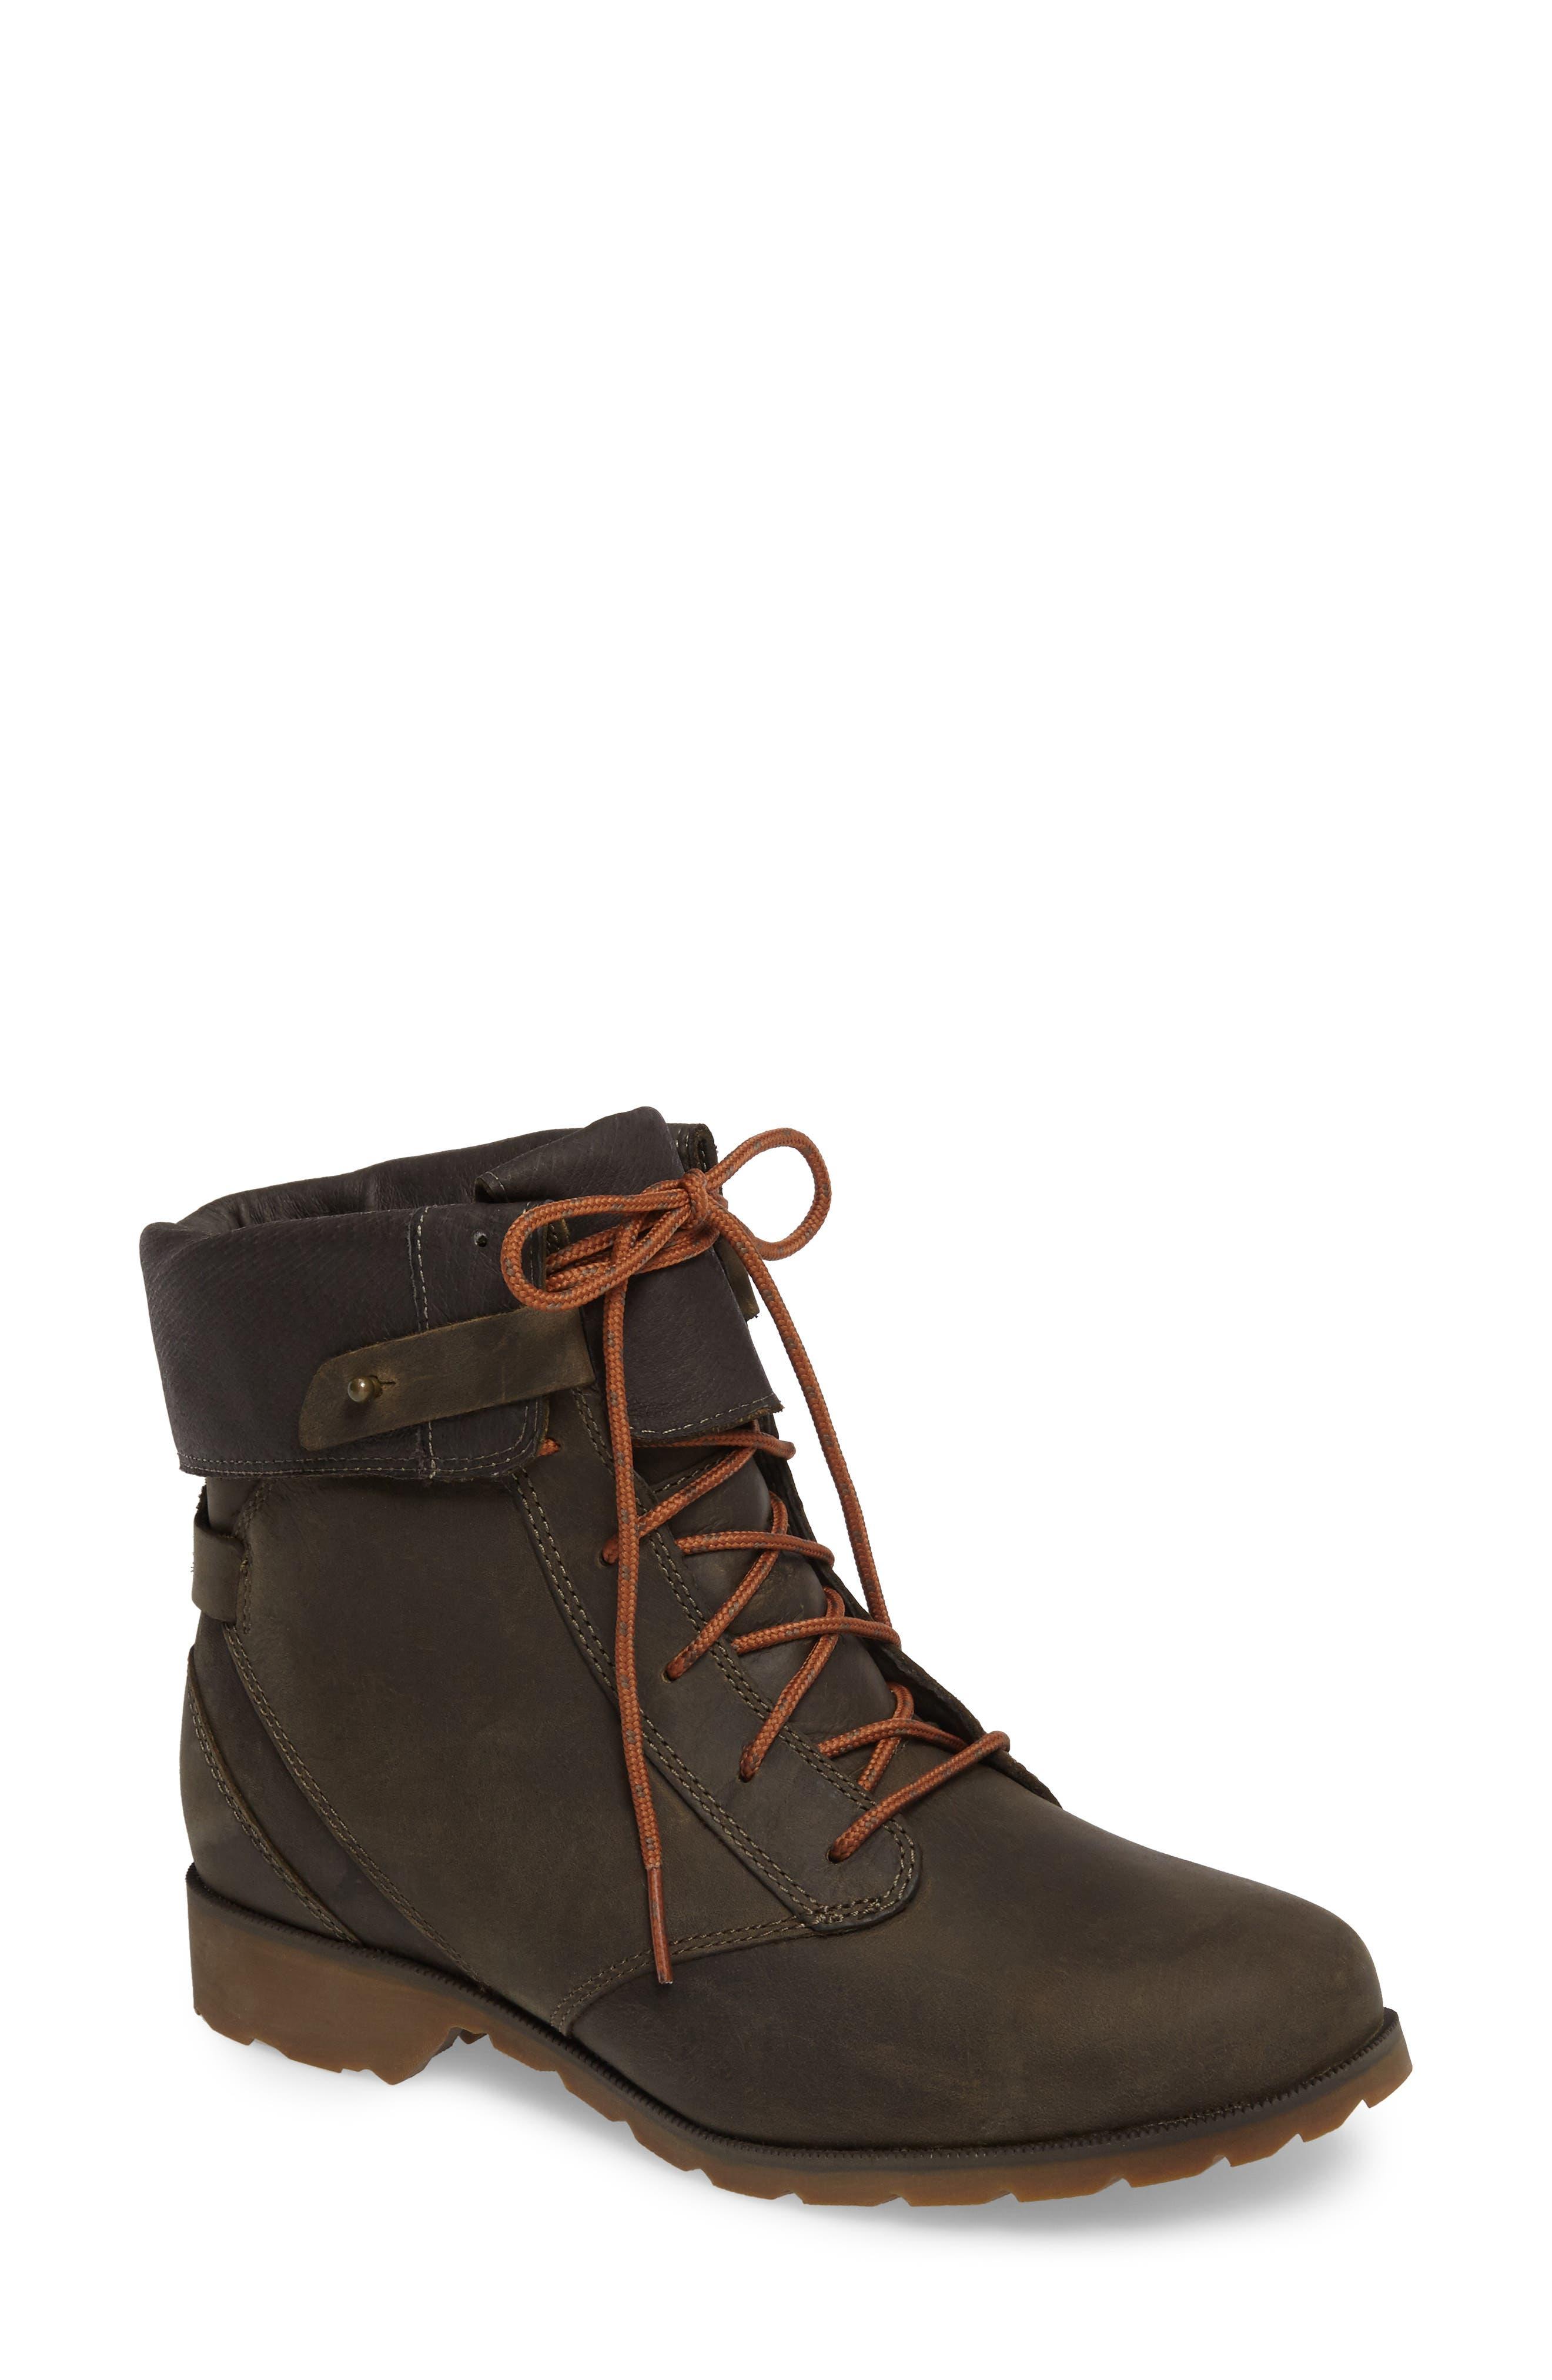 'De La Vina' Waterproof Lace-Up Boot,                             Main thumbnail 1, color,                             306